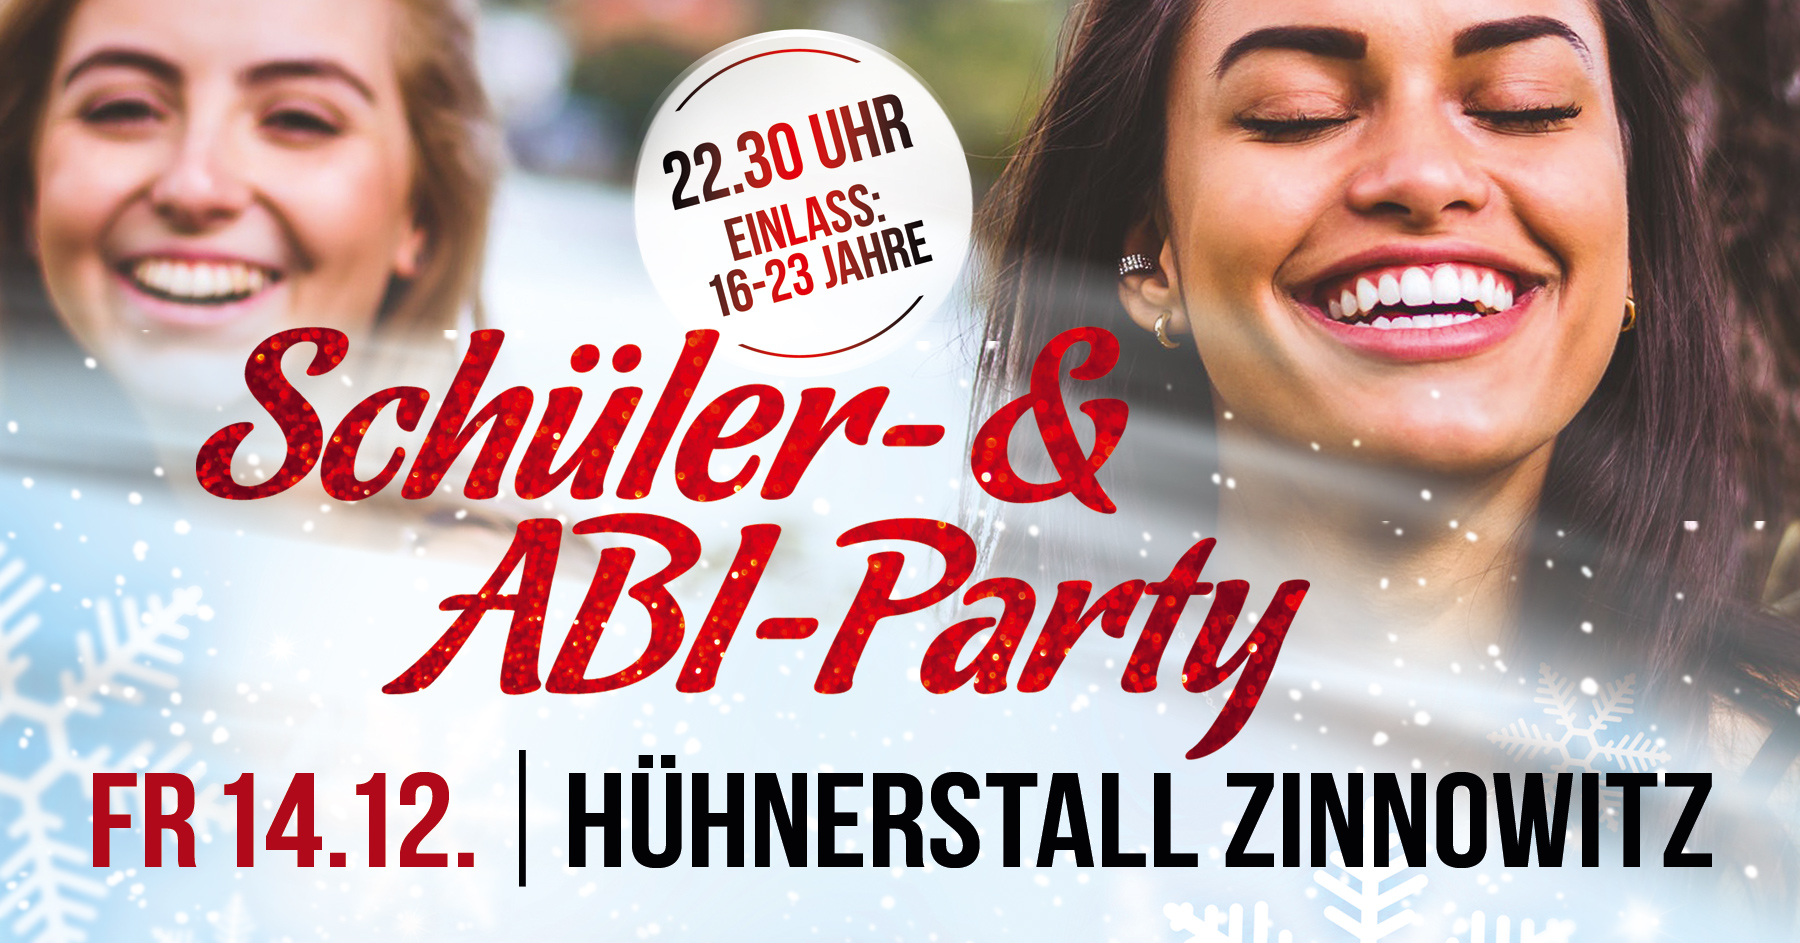 Schüler-& ABI Party - The New Generation